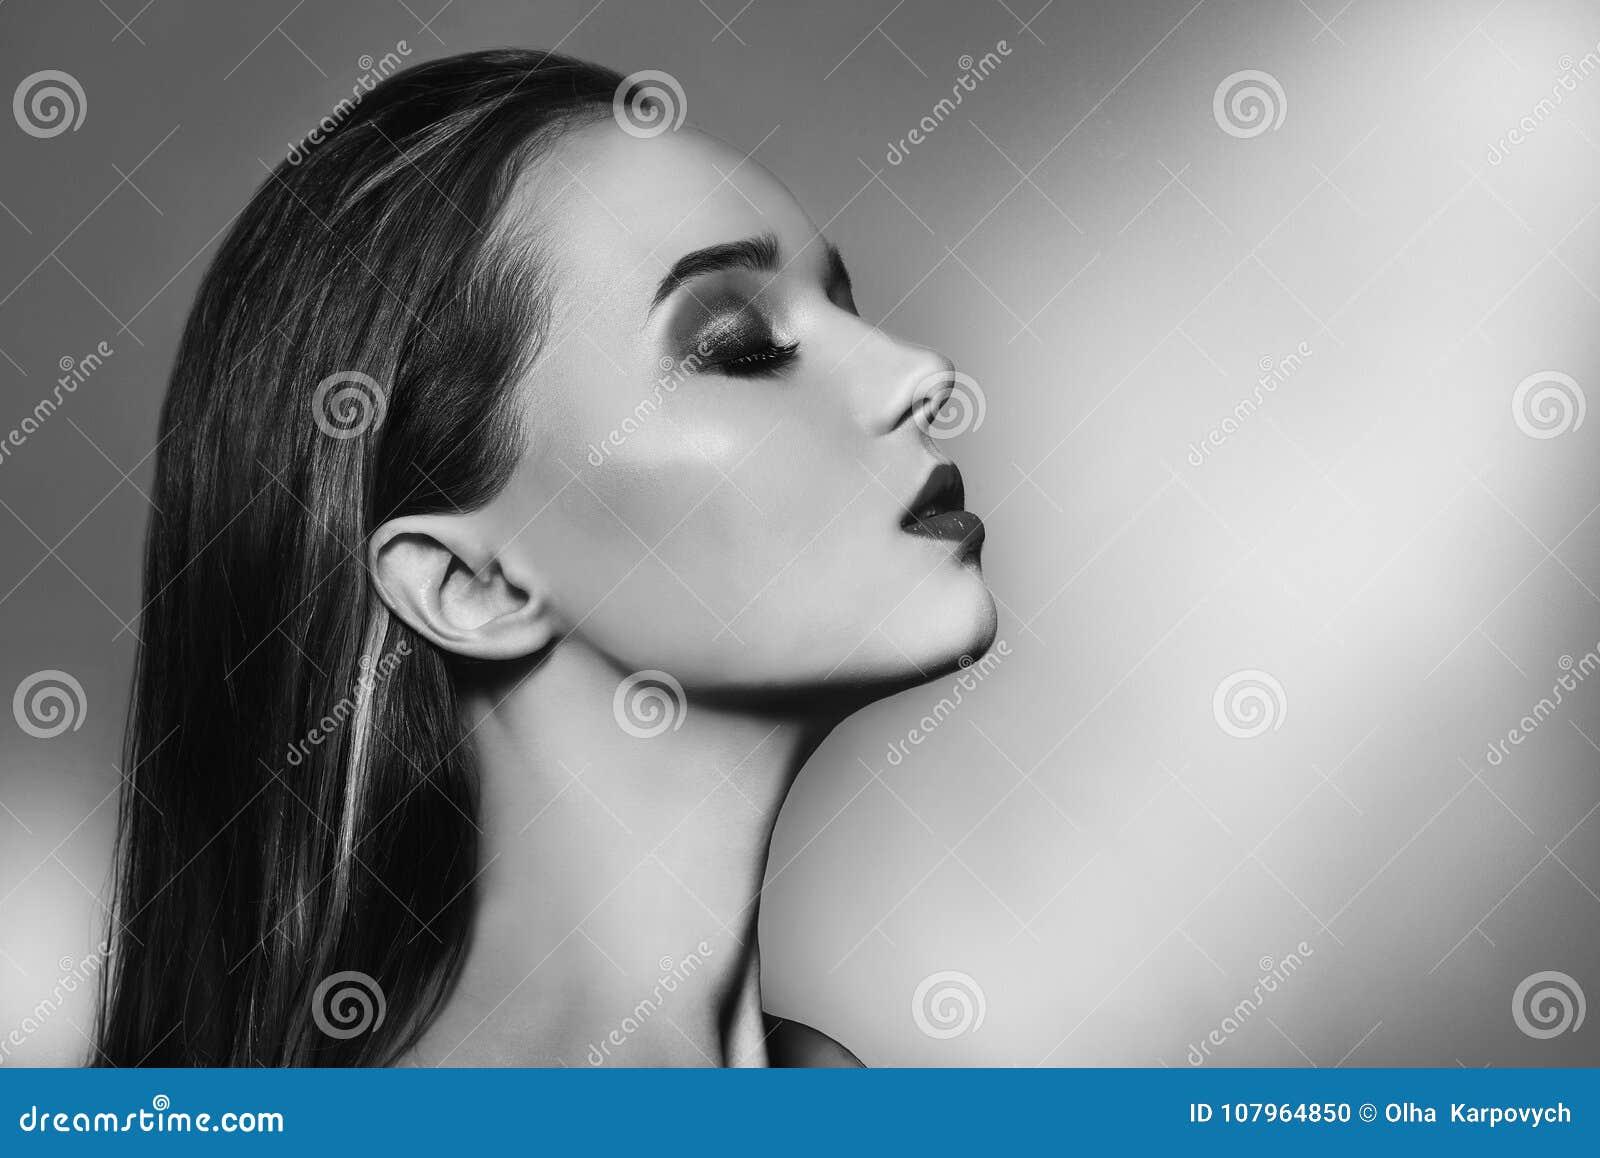 woman portrait with perfect makeup. Beauty Fashion model girl black and white portrait. Close up portrait of elegant luxuri